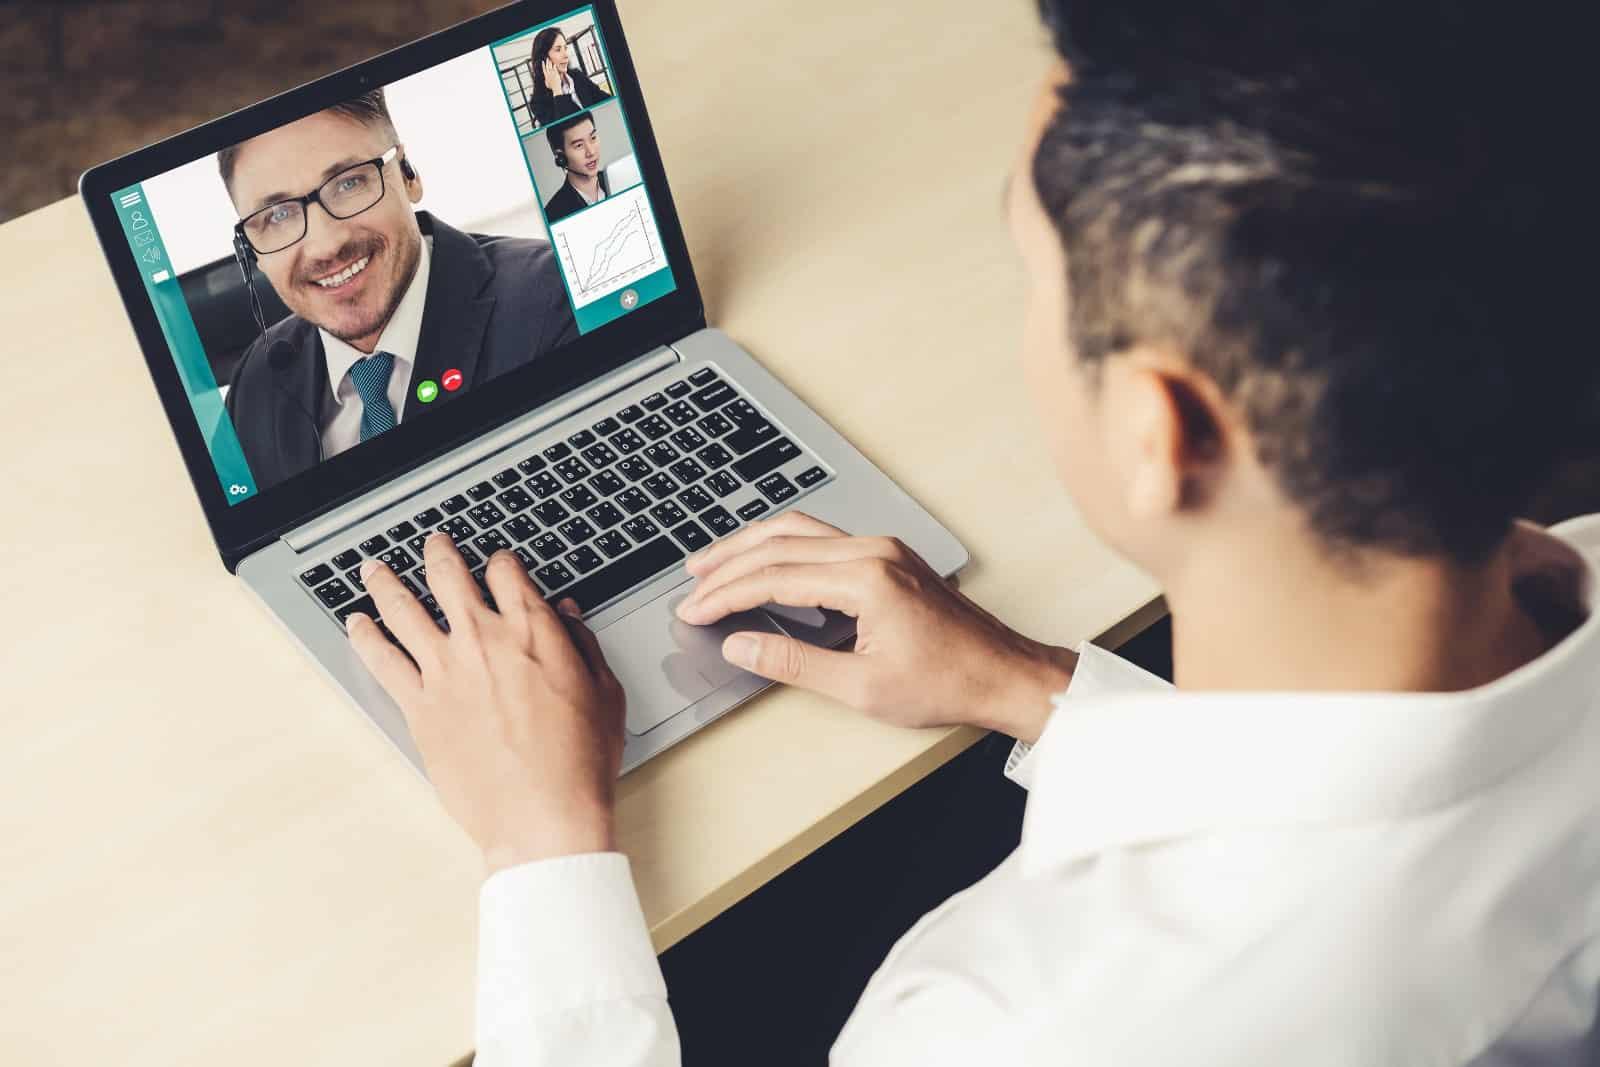 WebRTC per videoconferenze